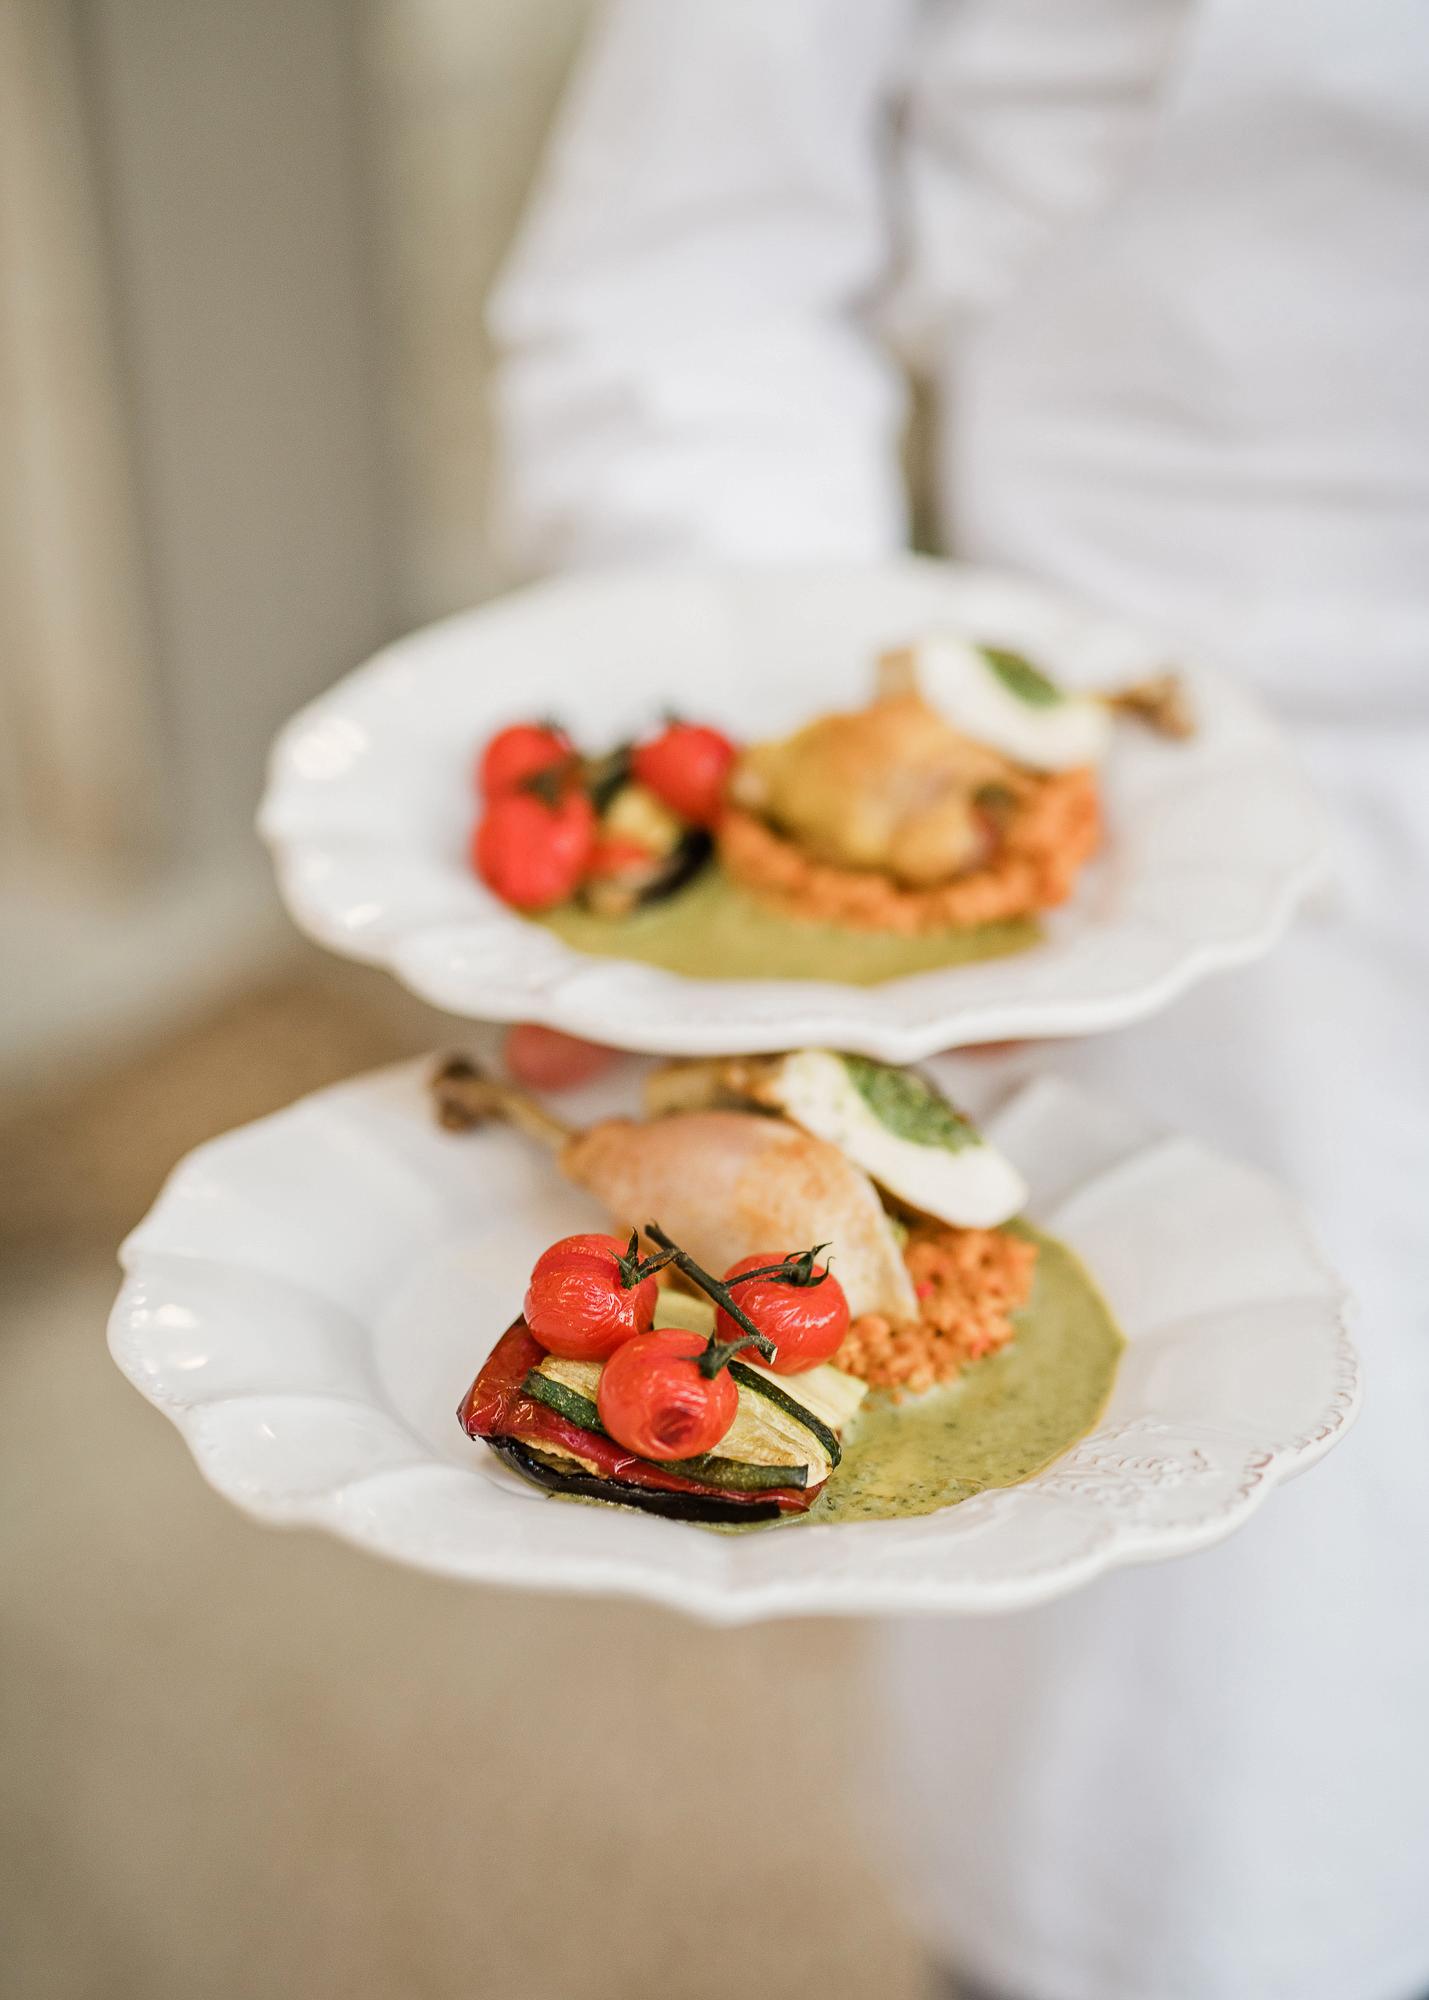 samantha grayson wedding serving plates of food